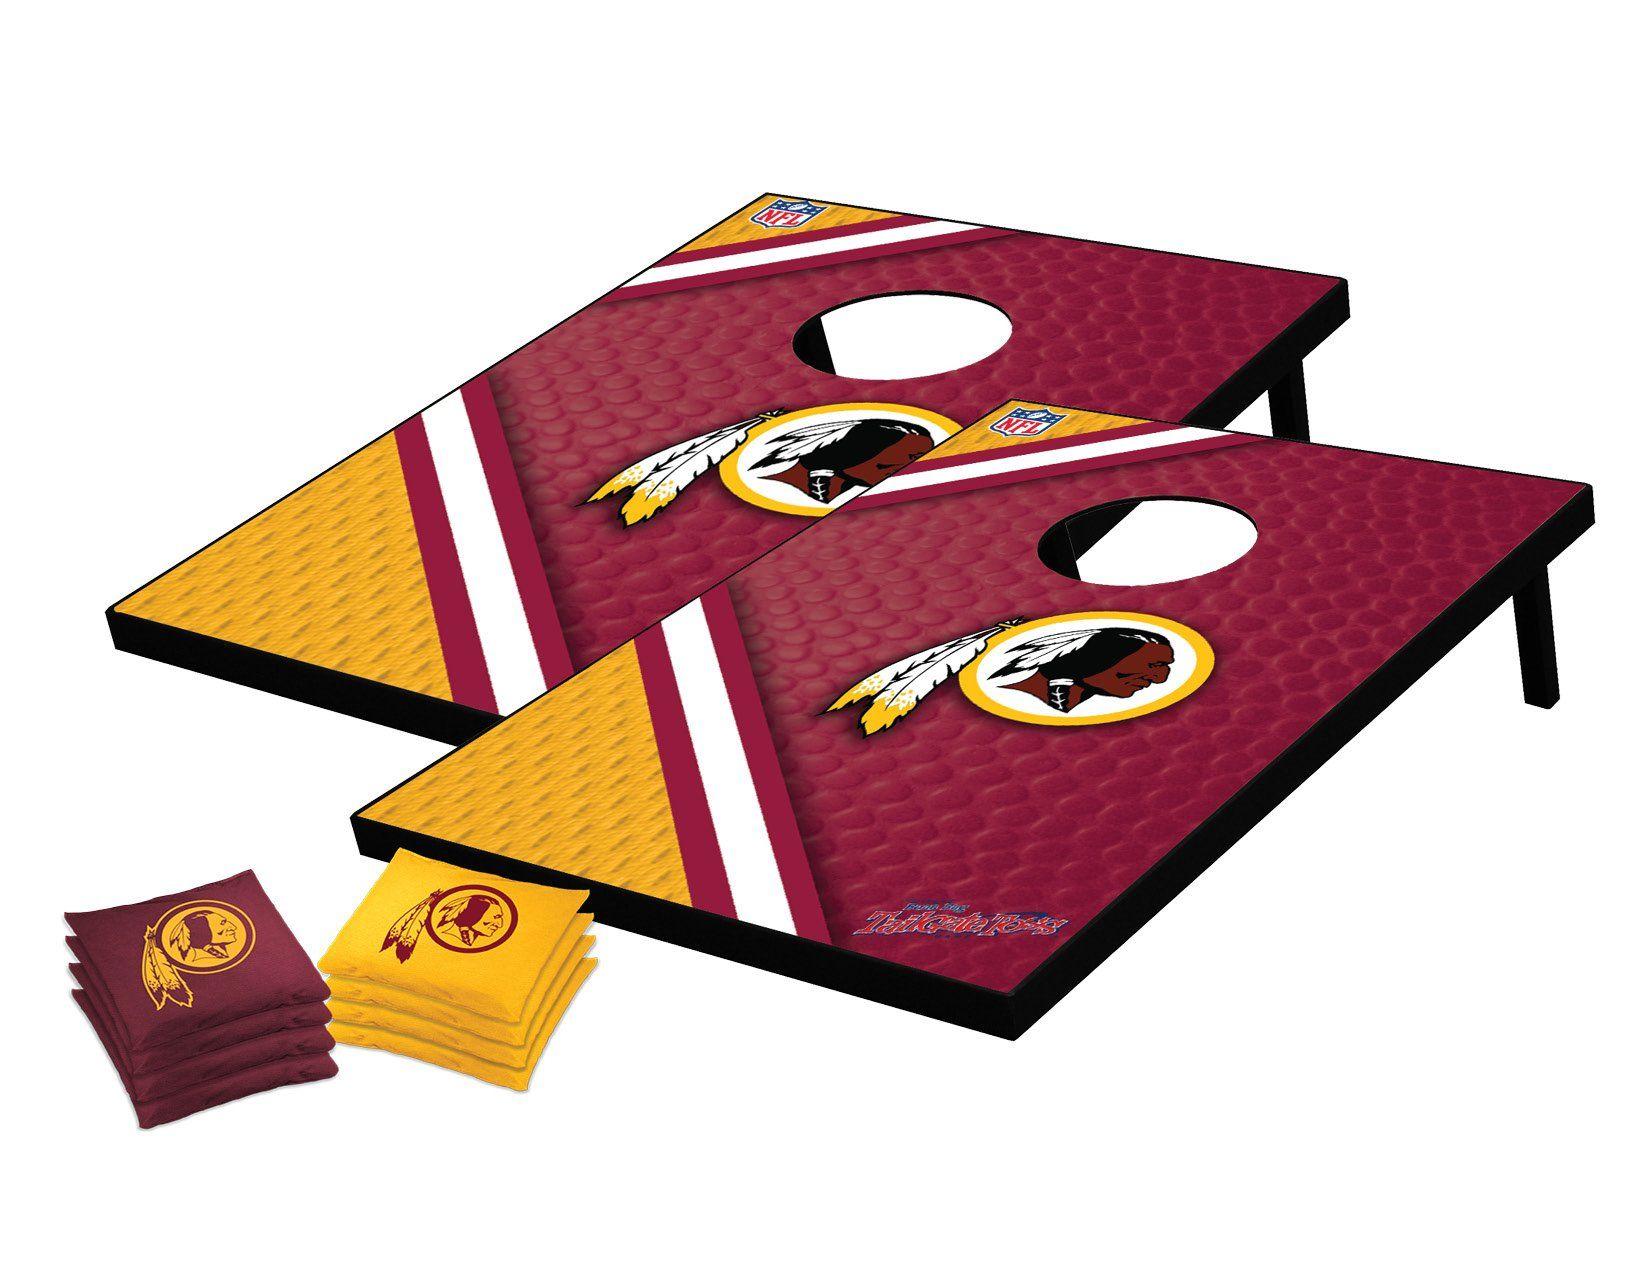 Remarkable Amazon Com Nfl Washington Redskins Tailgate Toss Bean Bag Uwap Interior Chair Design Uwaporg